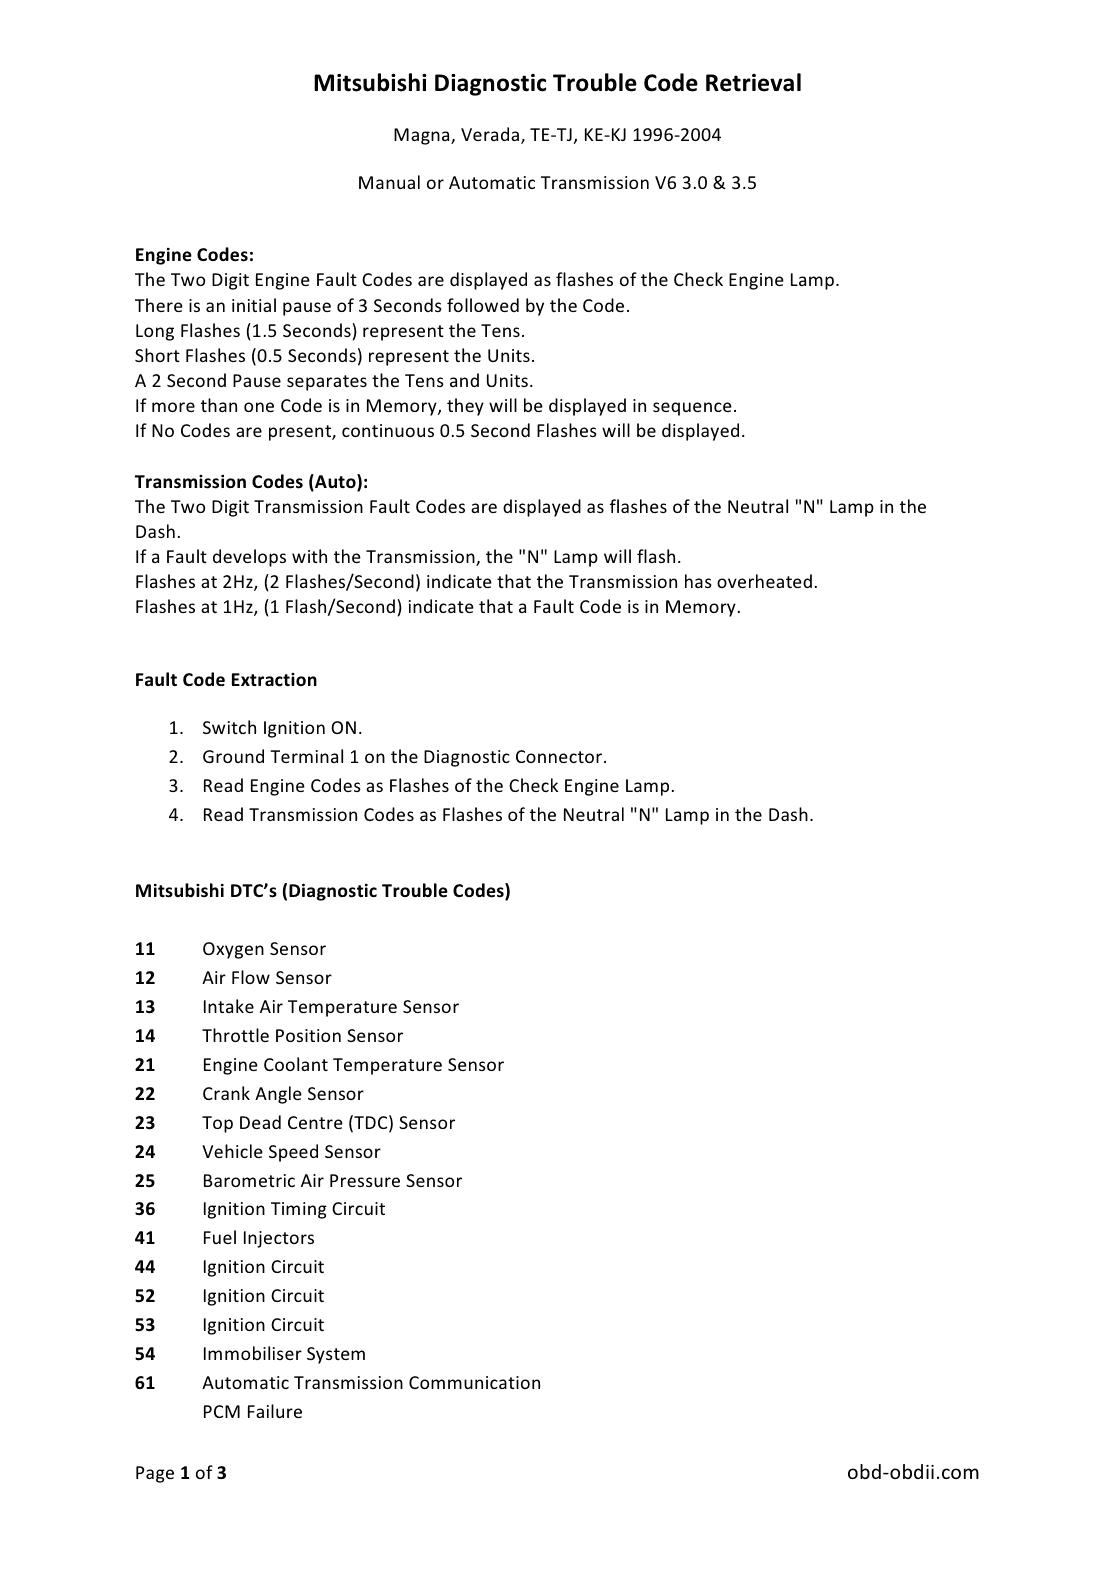 Mitsubishi Manuals: 2011